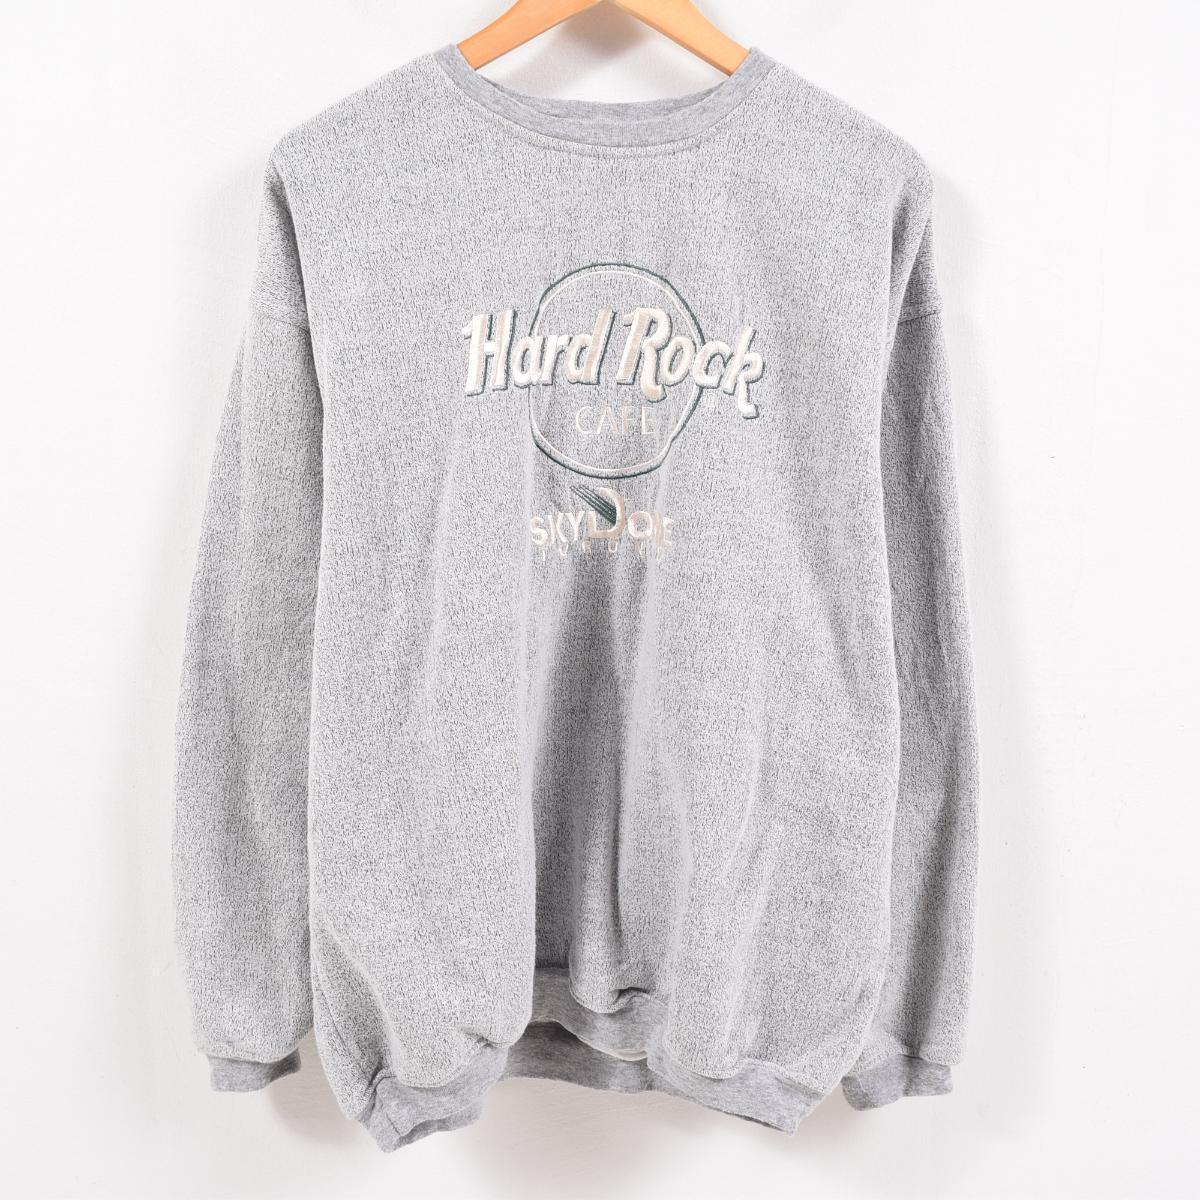 b4f05e6f Men L /wbc3296 made in Hard Rock Cafe HARD ROCK CAFE SKYDOME TORONTO logo  sweat shirt trainer Canada